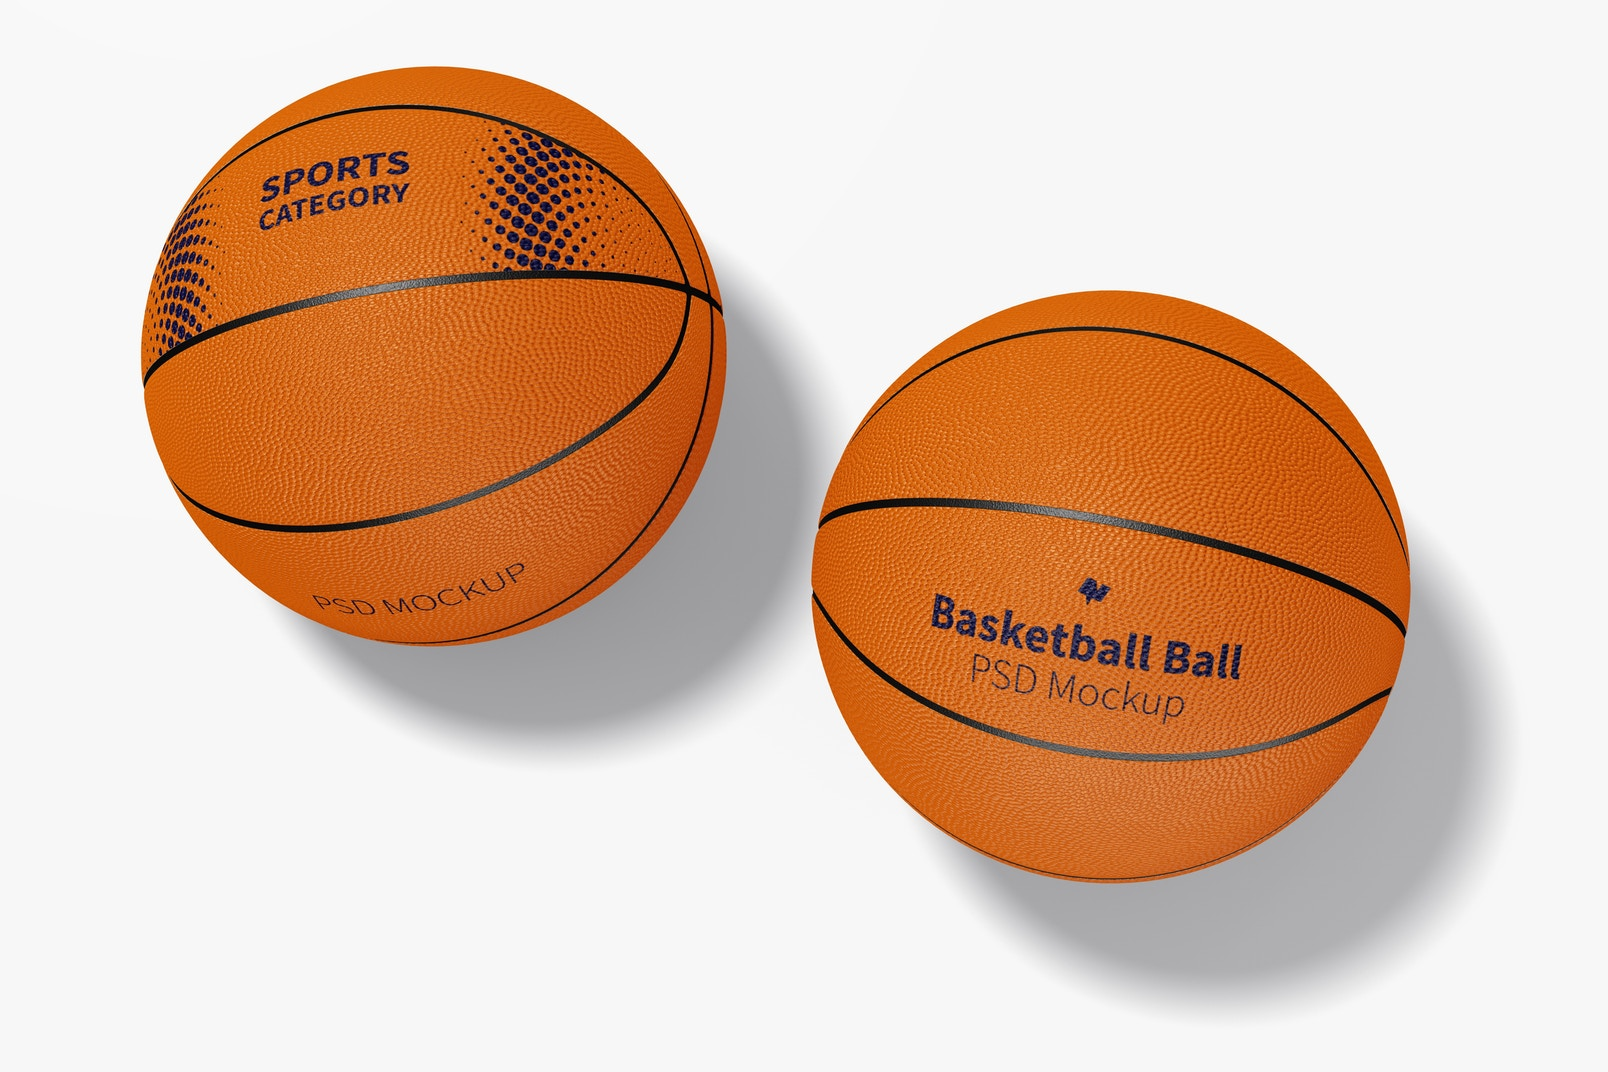 Basketball Balls Mockup, Top View